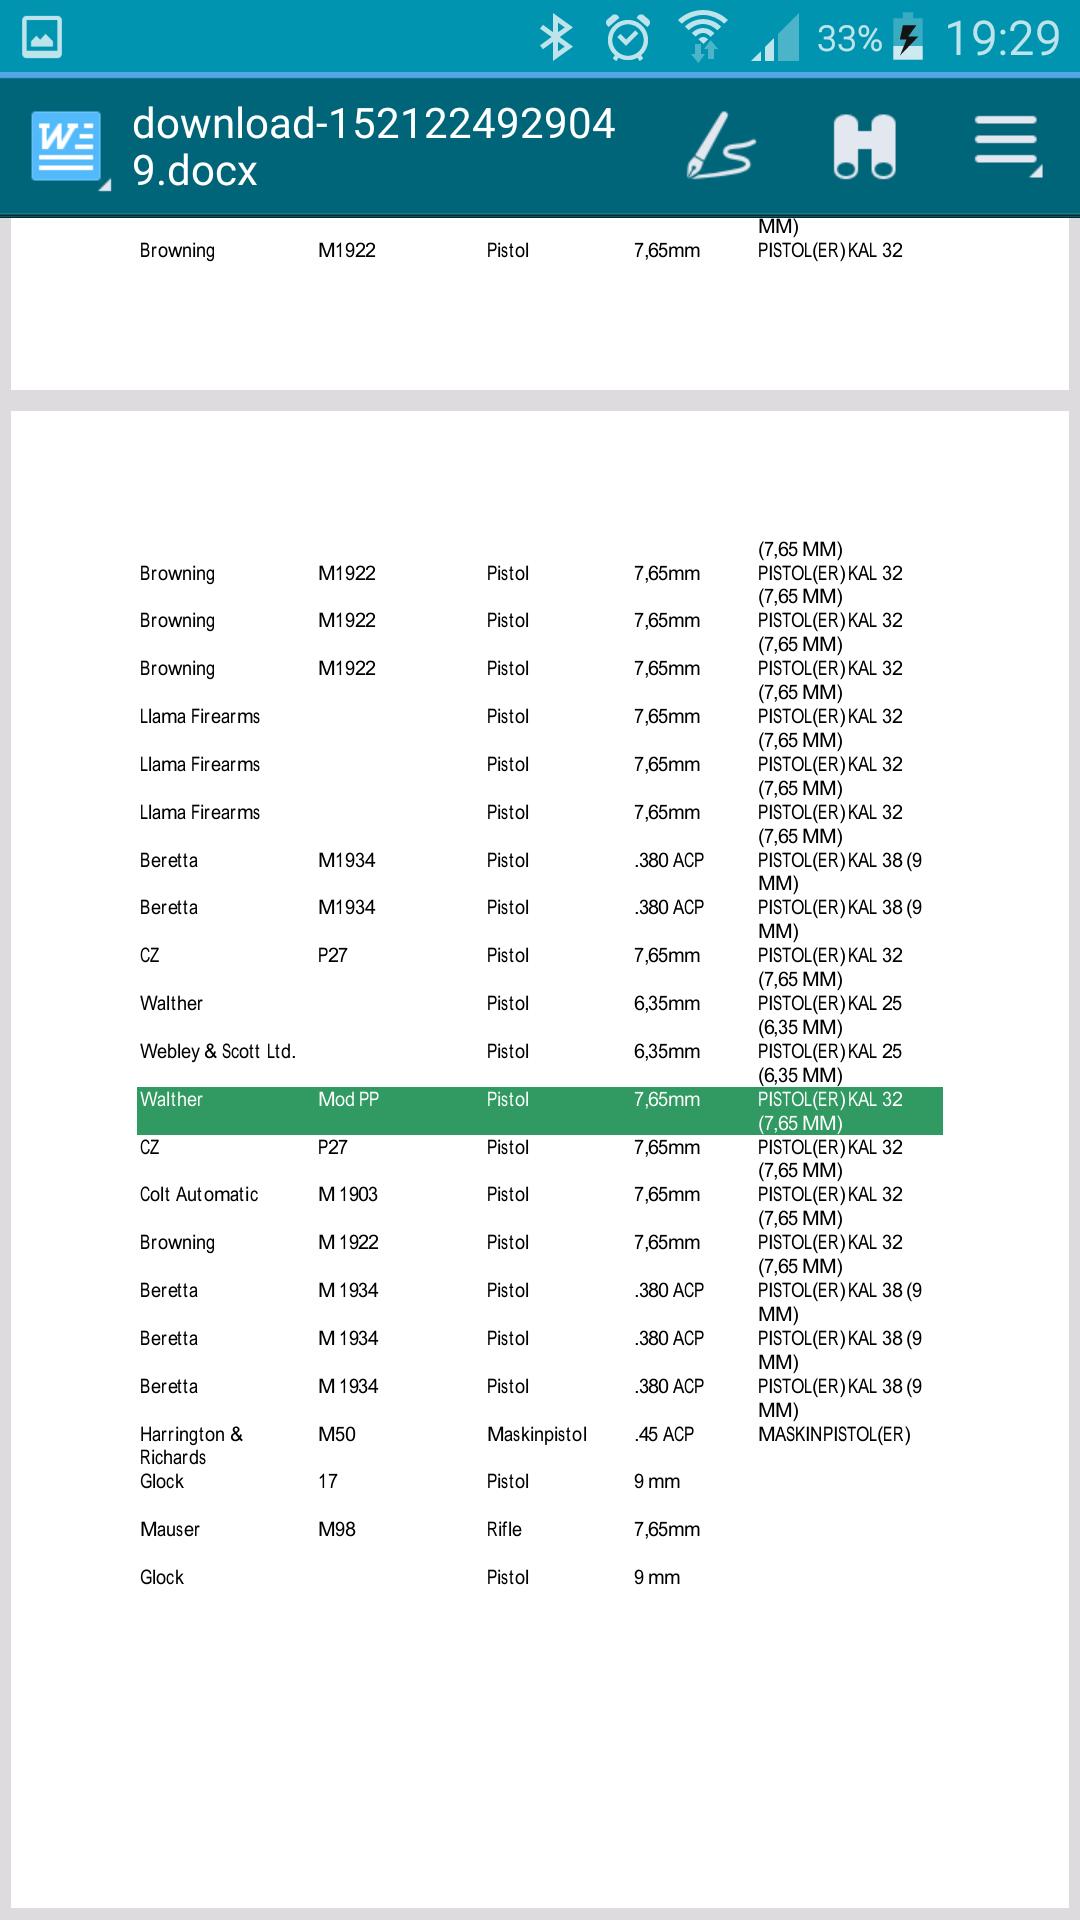 Screenshot_2018-03-16-19-29-19.png